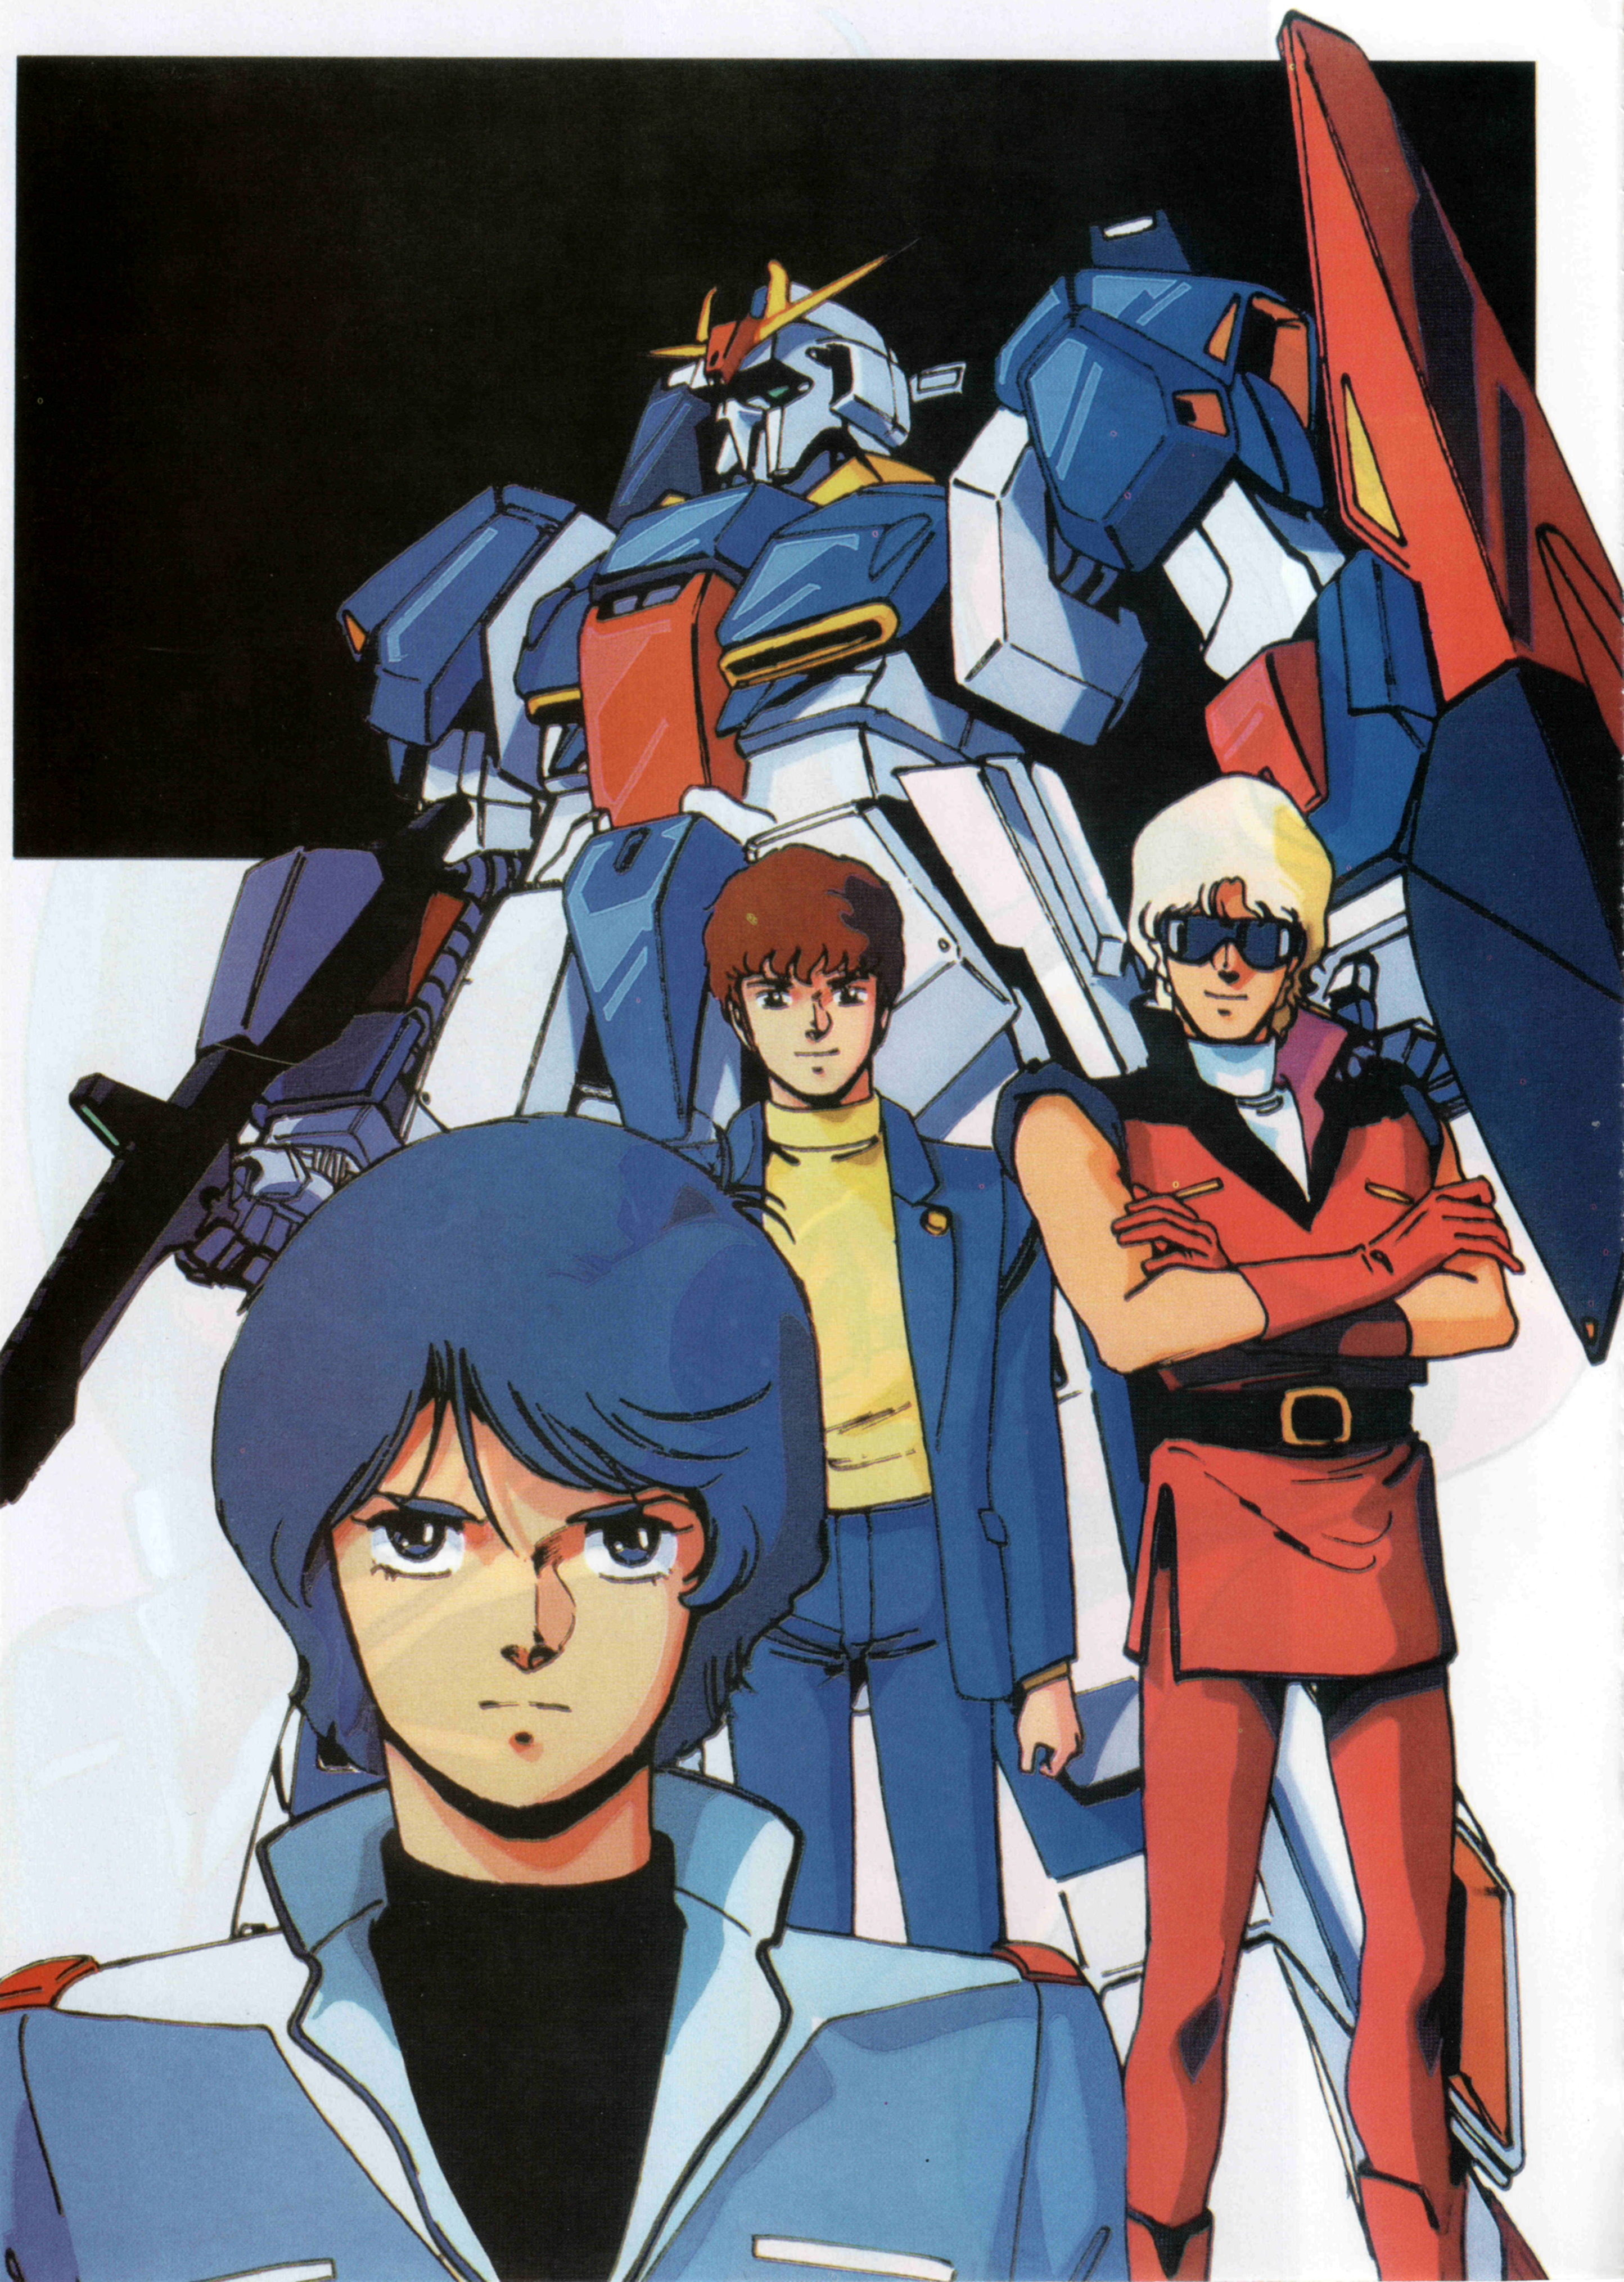 Mobile Suit Zeta Gundam (Char Aznable, Kamille Bidan, Amuro